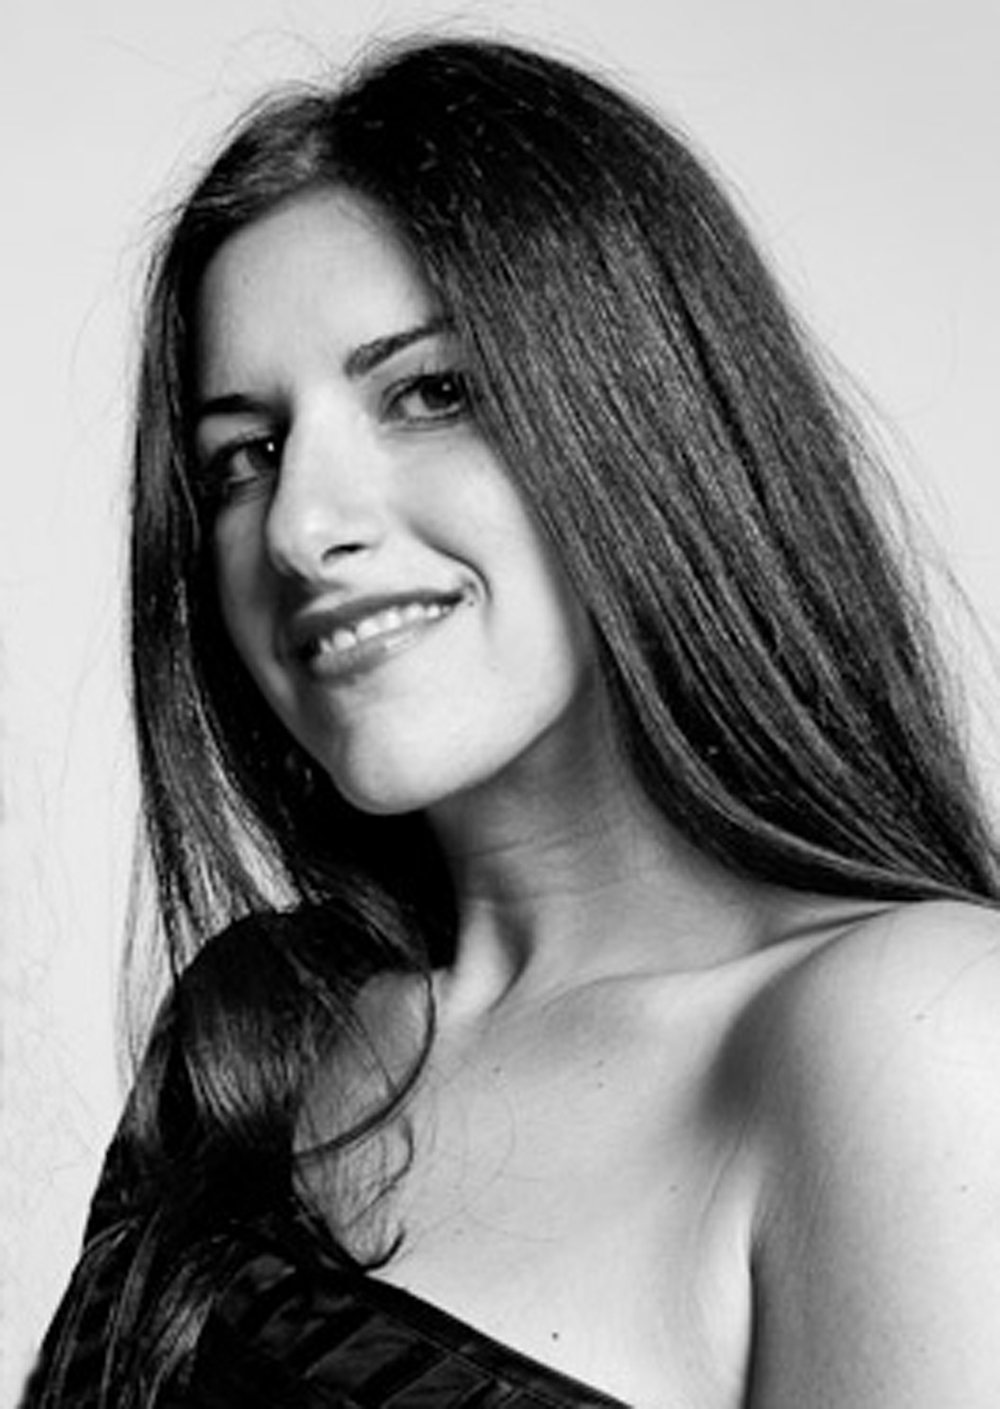 Nathalie Kirsheh Portrait 1.jpg